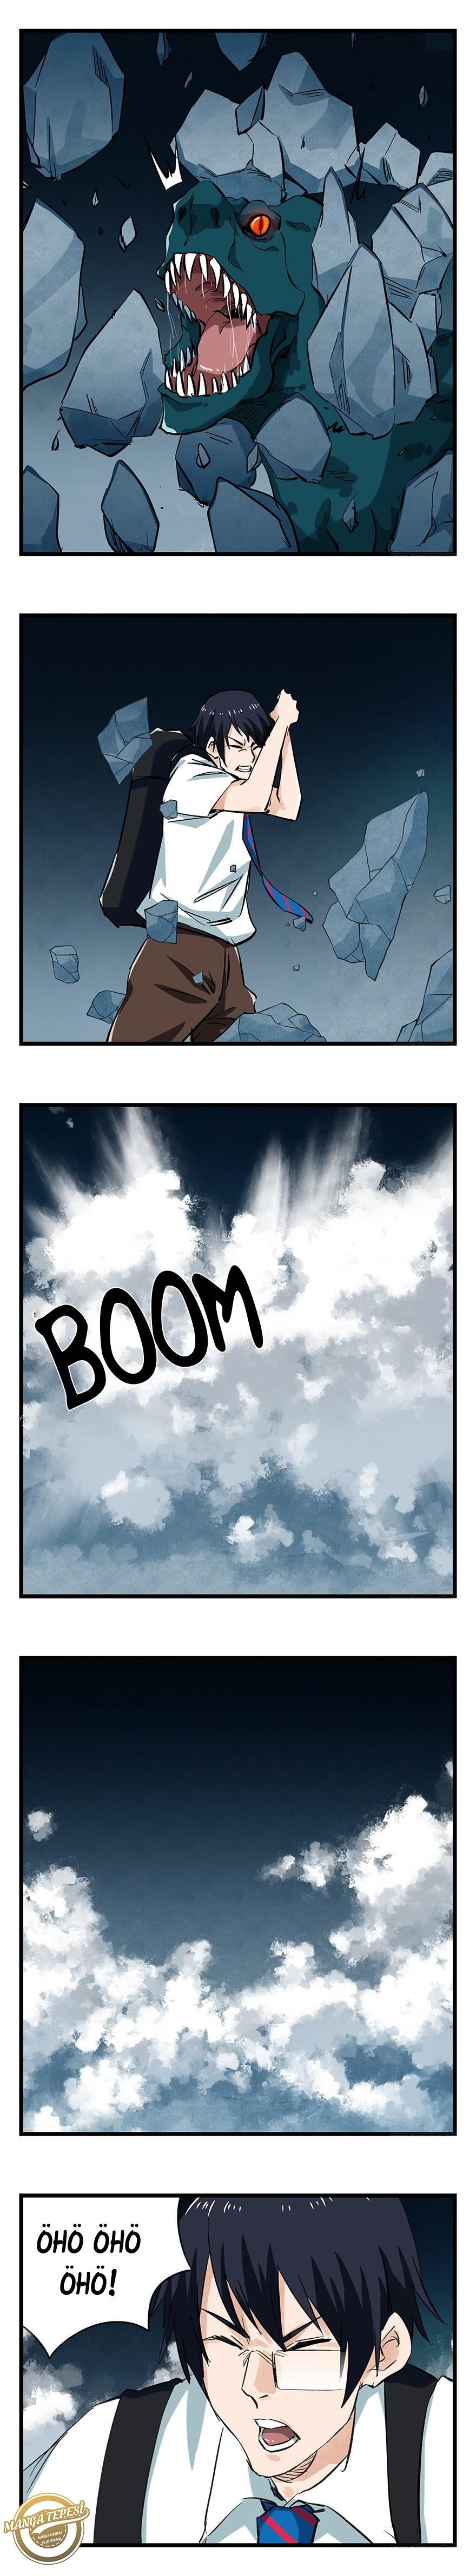 tower-into-the-cloudsbolum-69